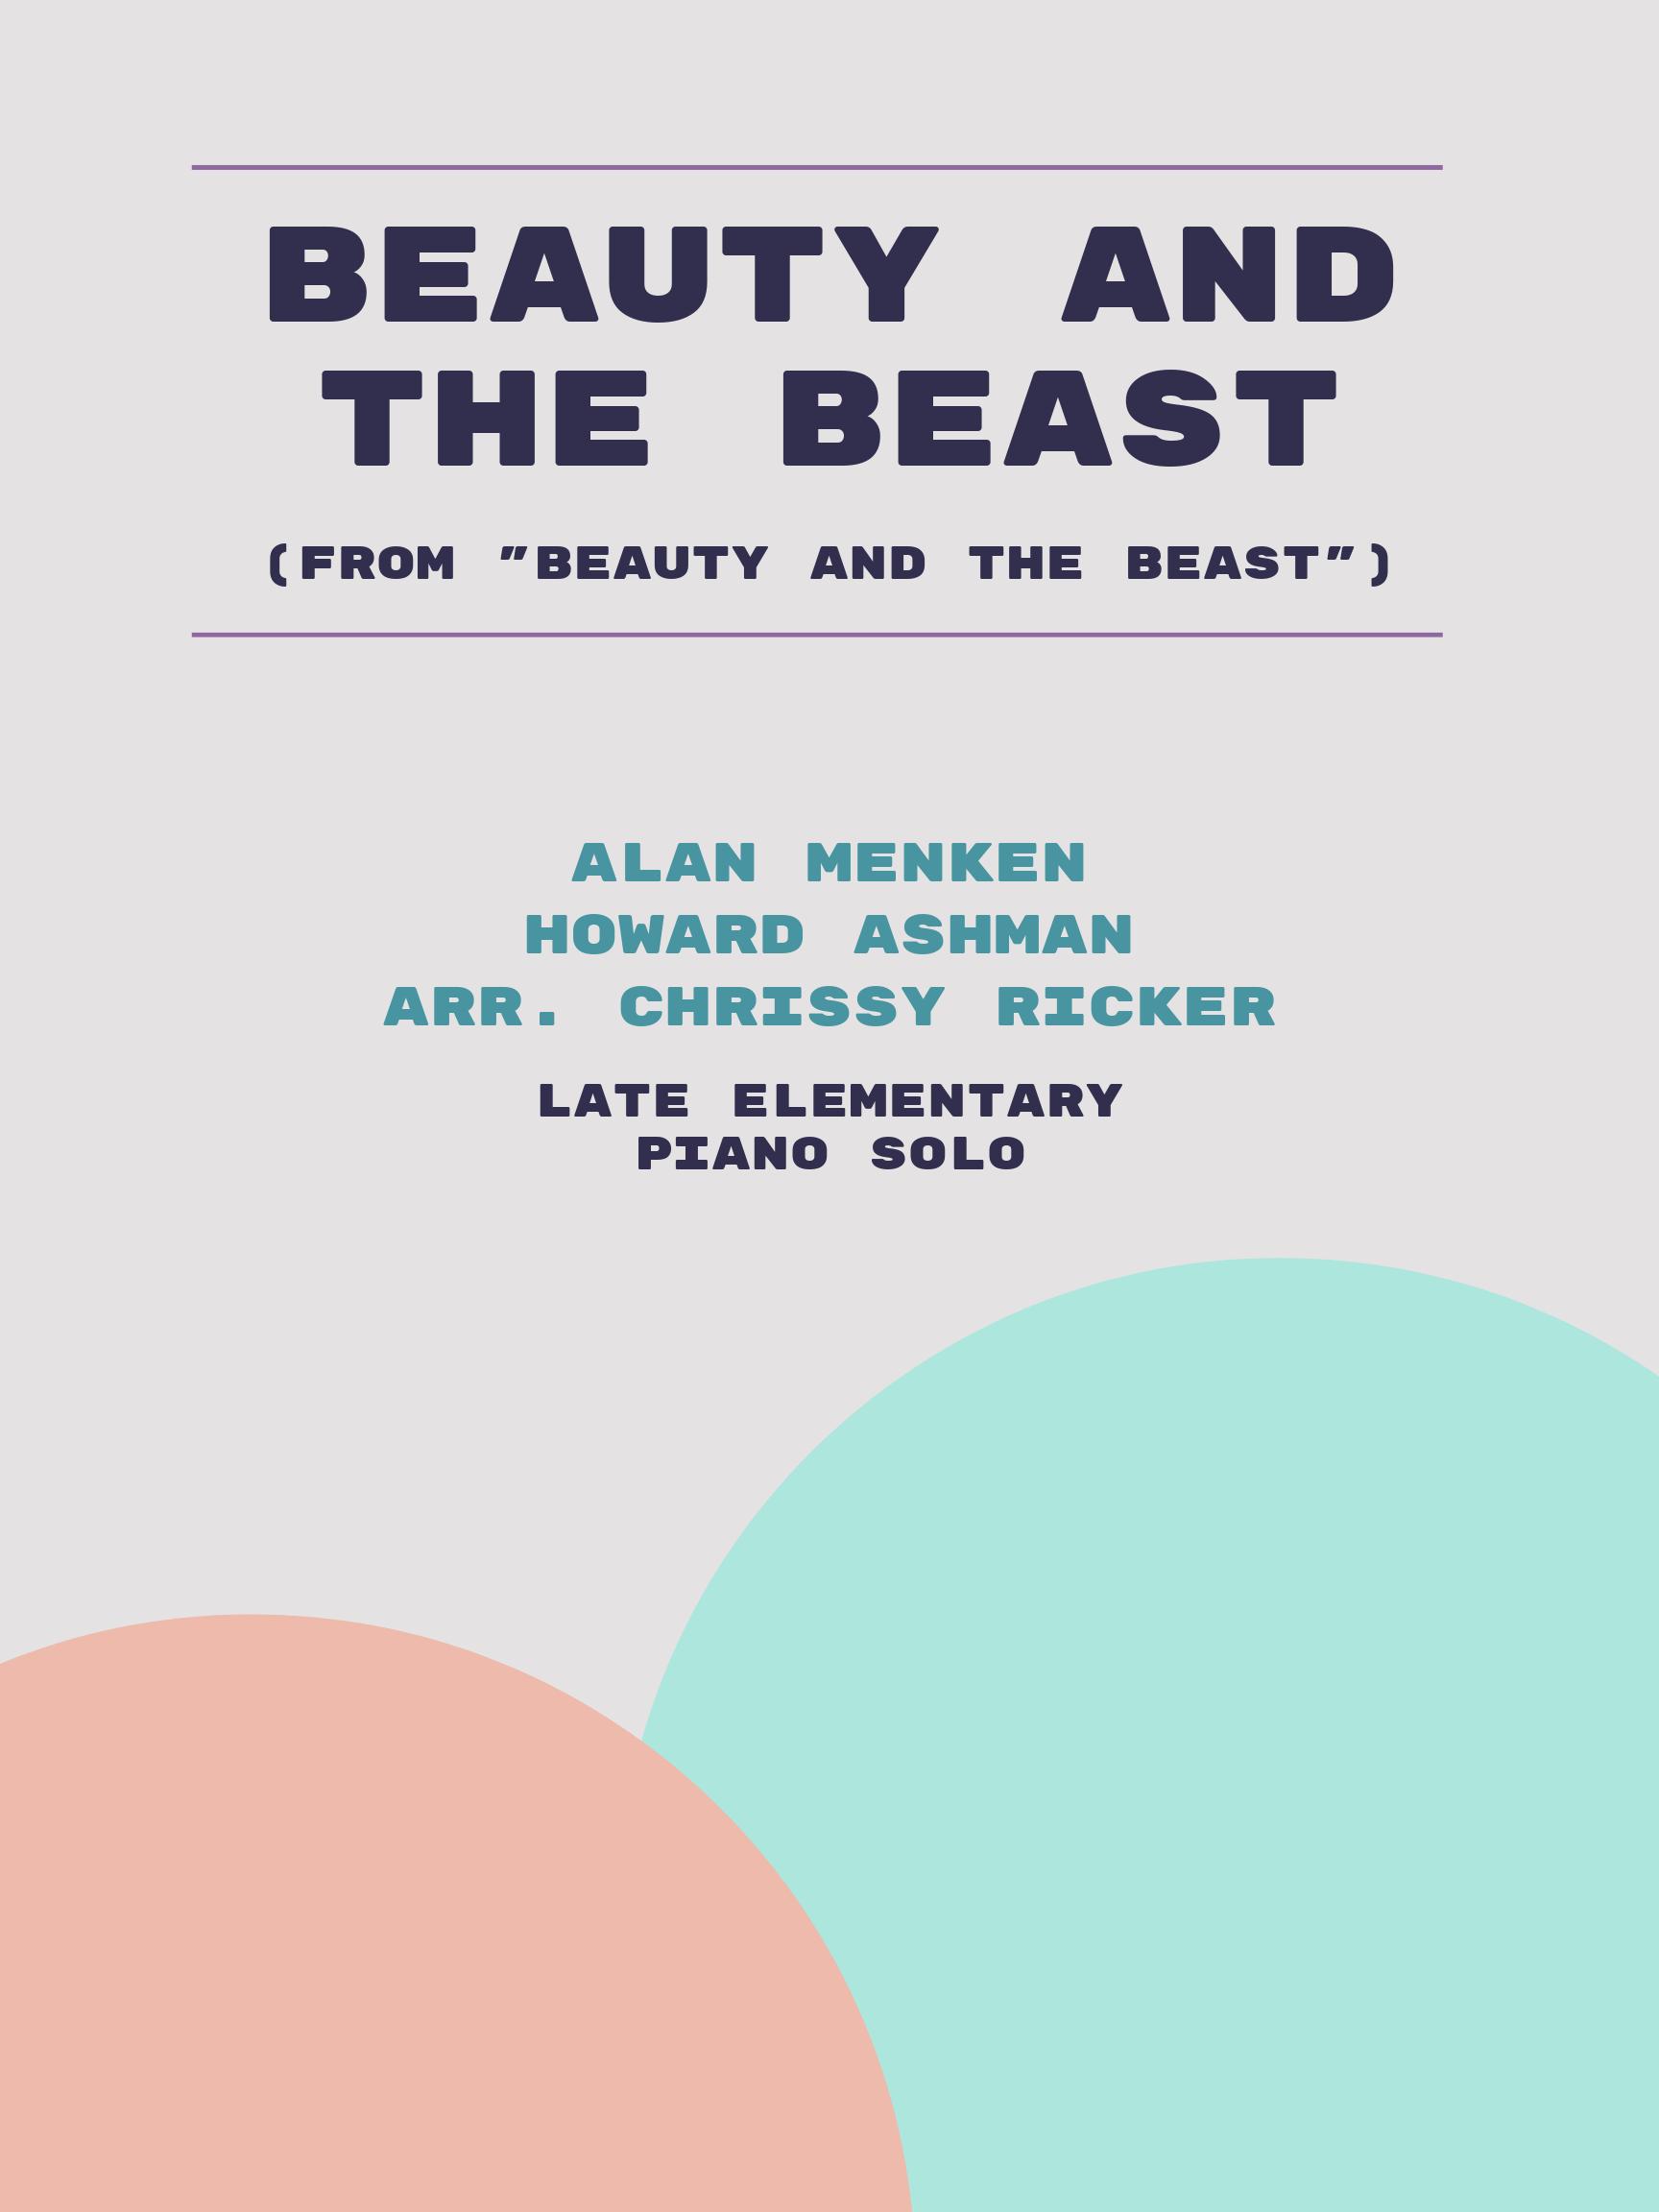 Beauty and the Beast by Alan Menken, Howard Ashman